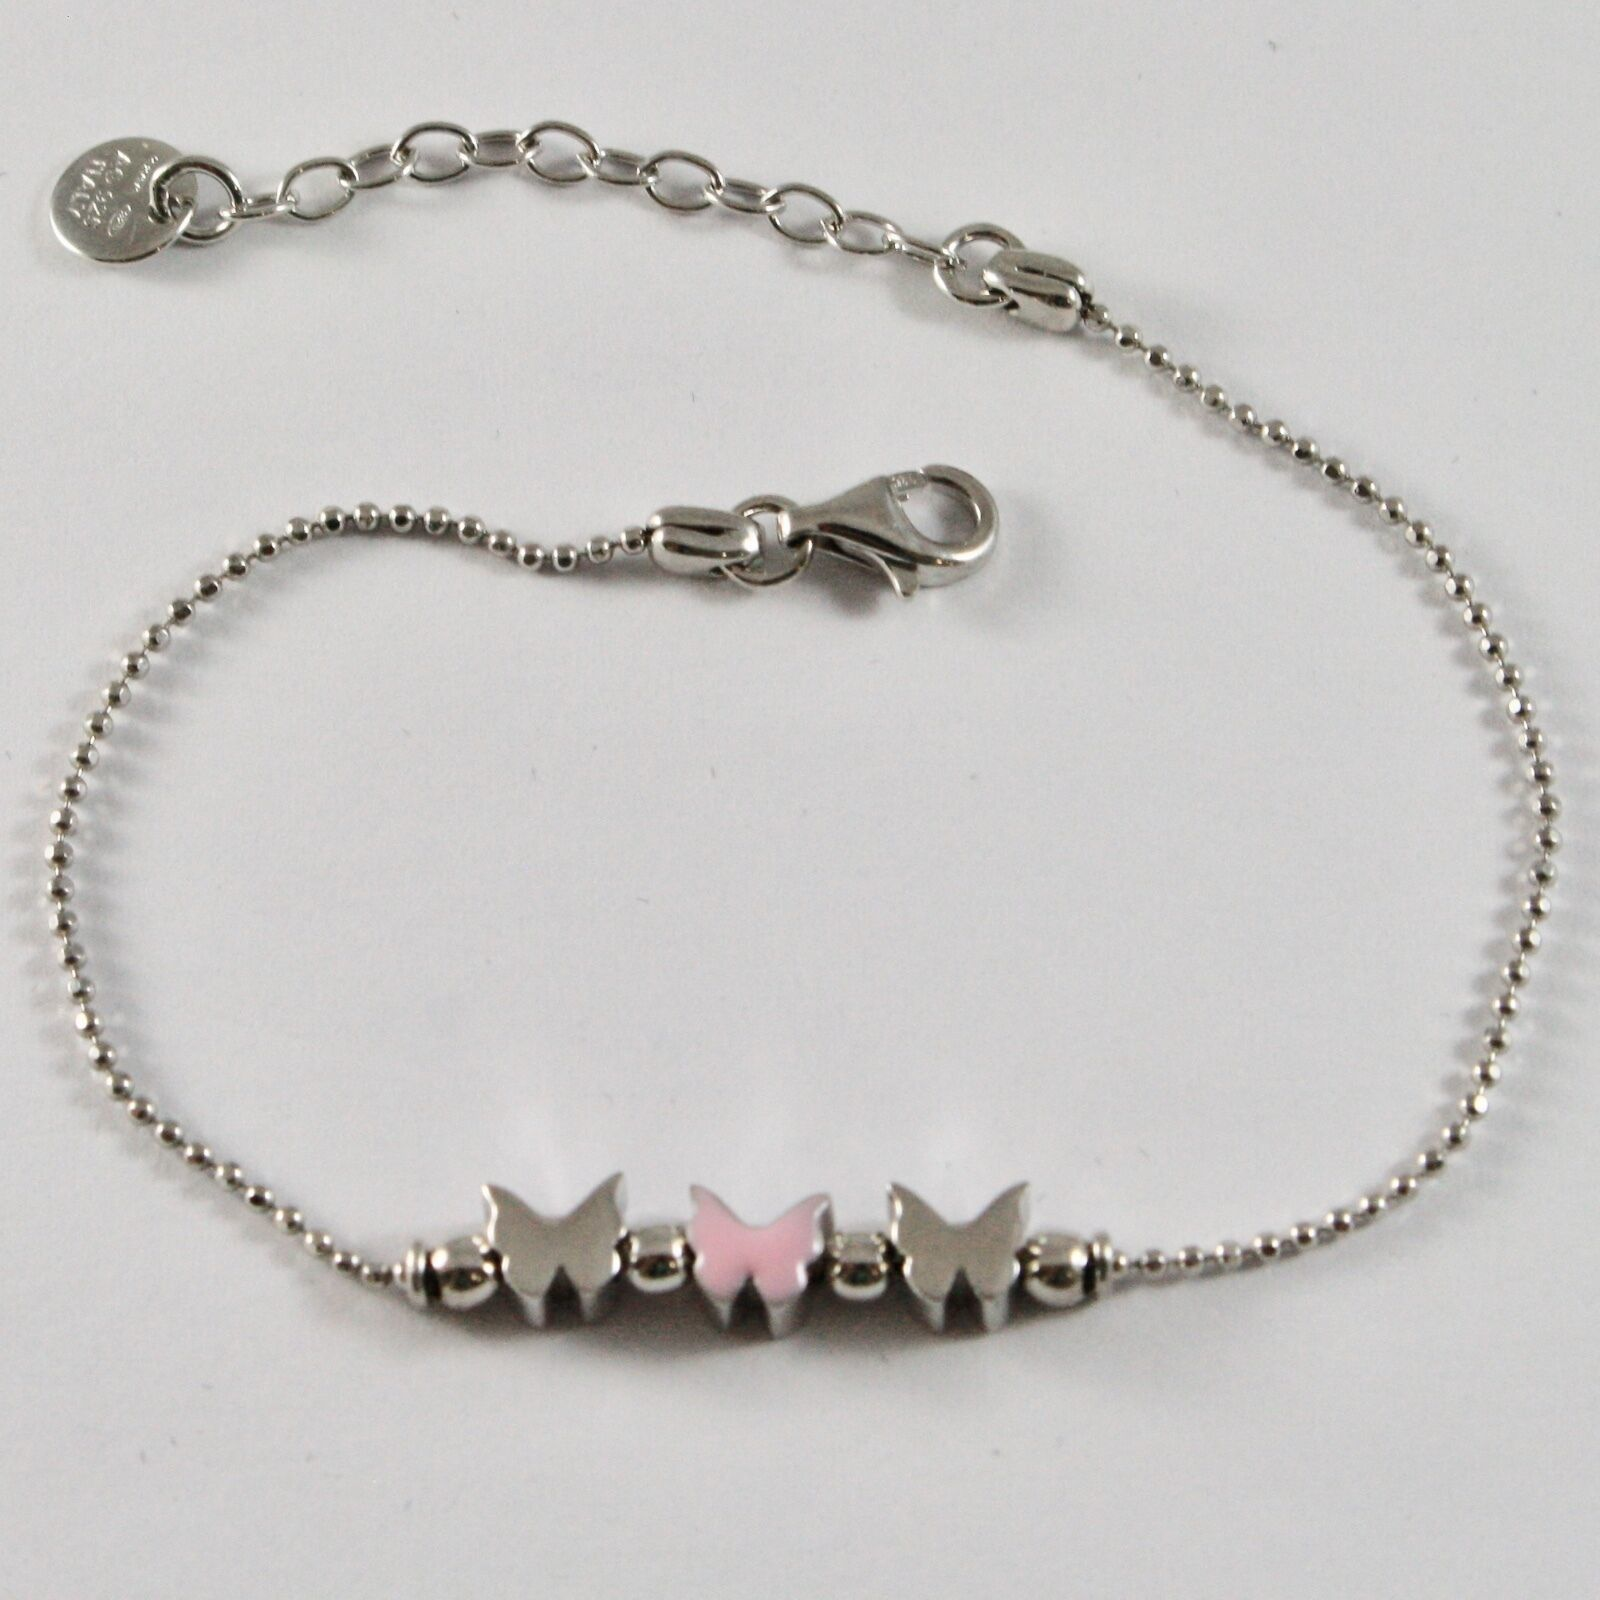 Silver Bracelet 925 Jack&co Butterflies Stylized Balls Faceted JCB0902 image 2